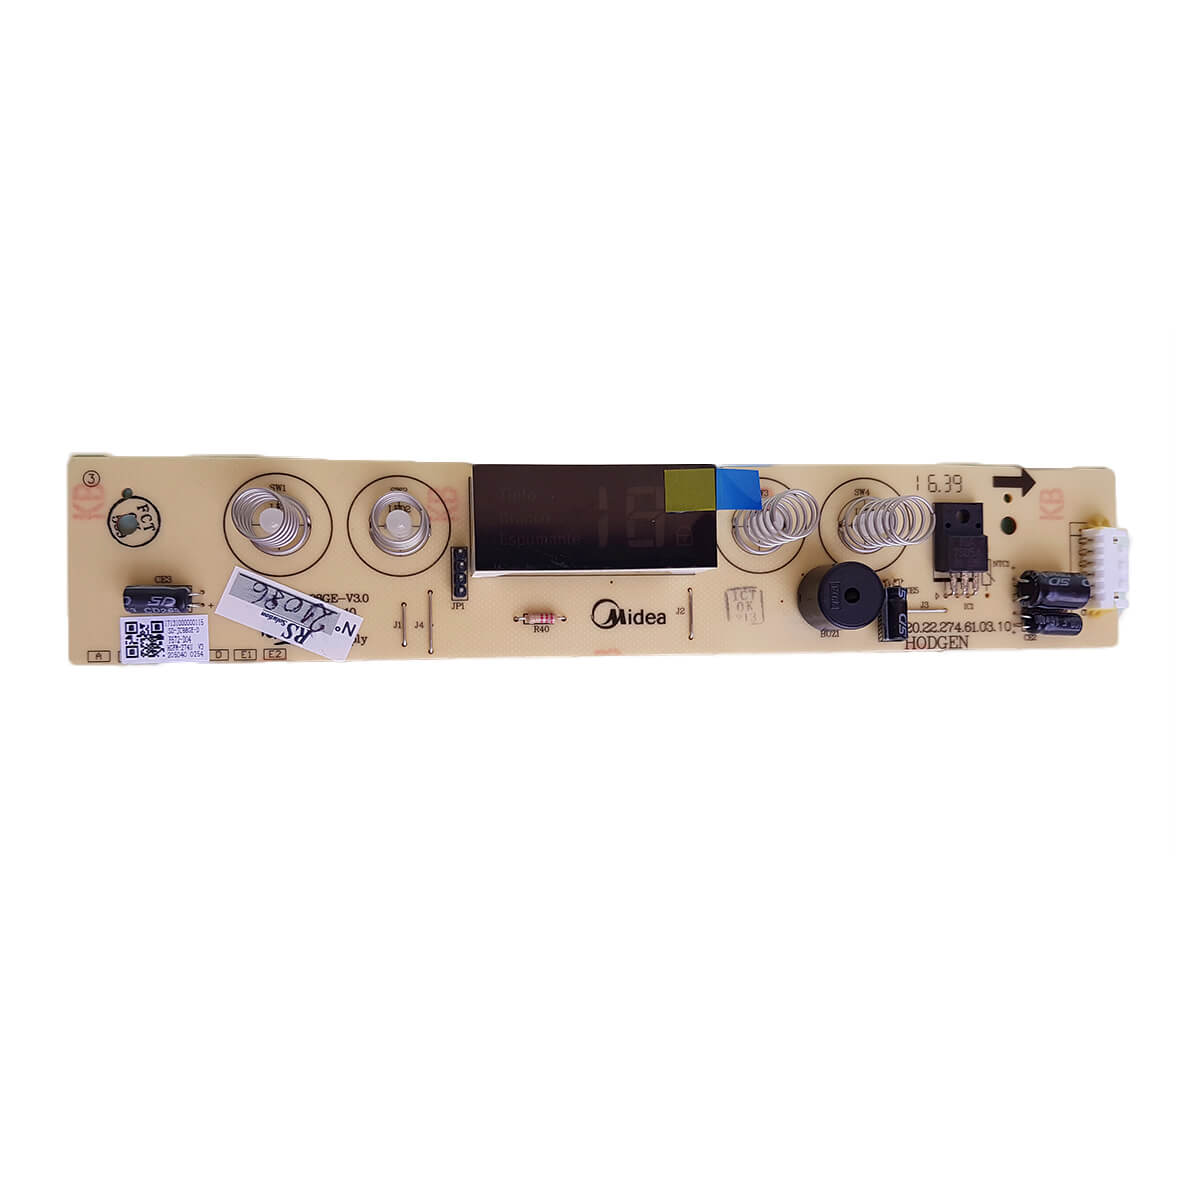 Placa Interface Adega Electrolux ACS34 ACS24 - 502301060111